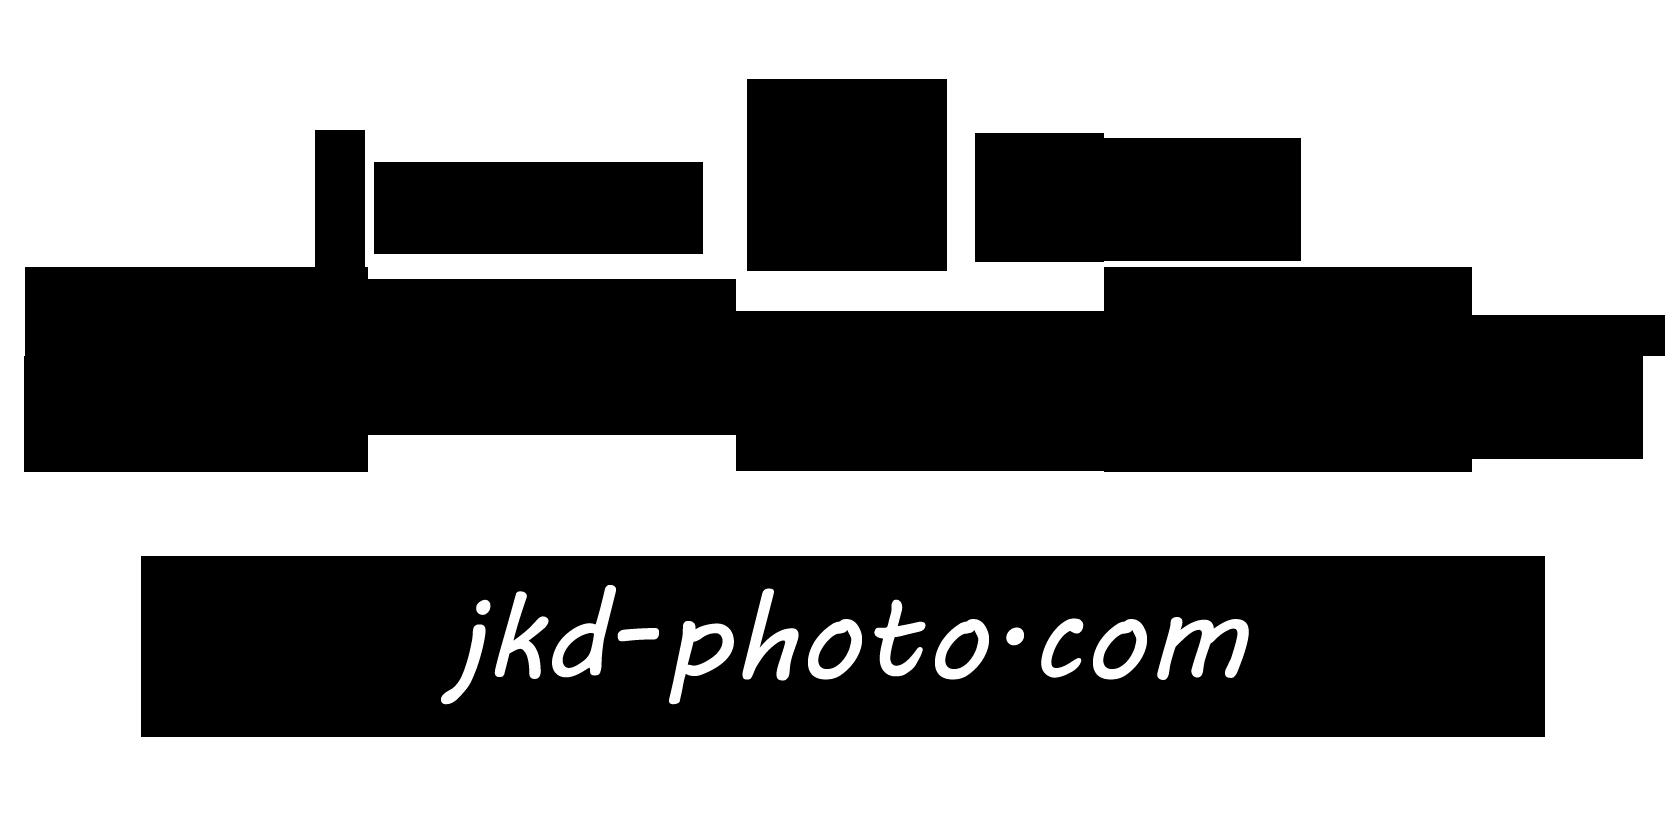 James K Davis Photography